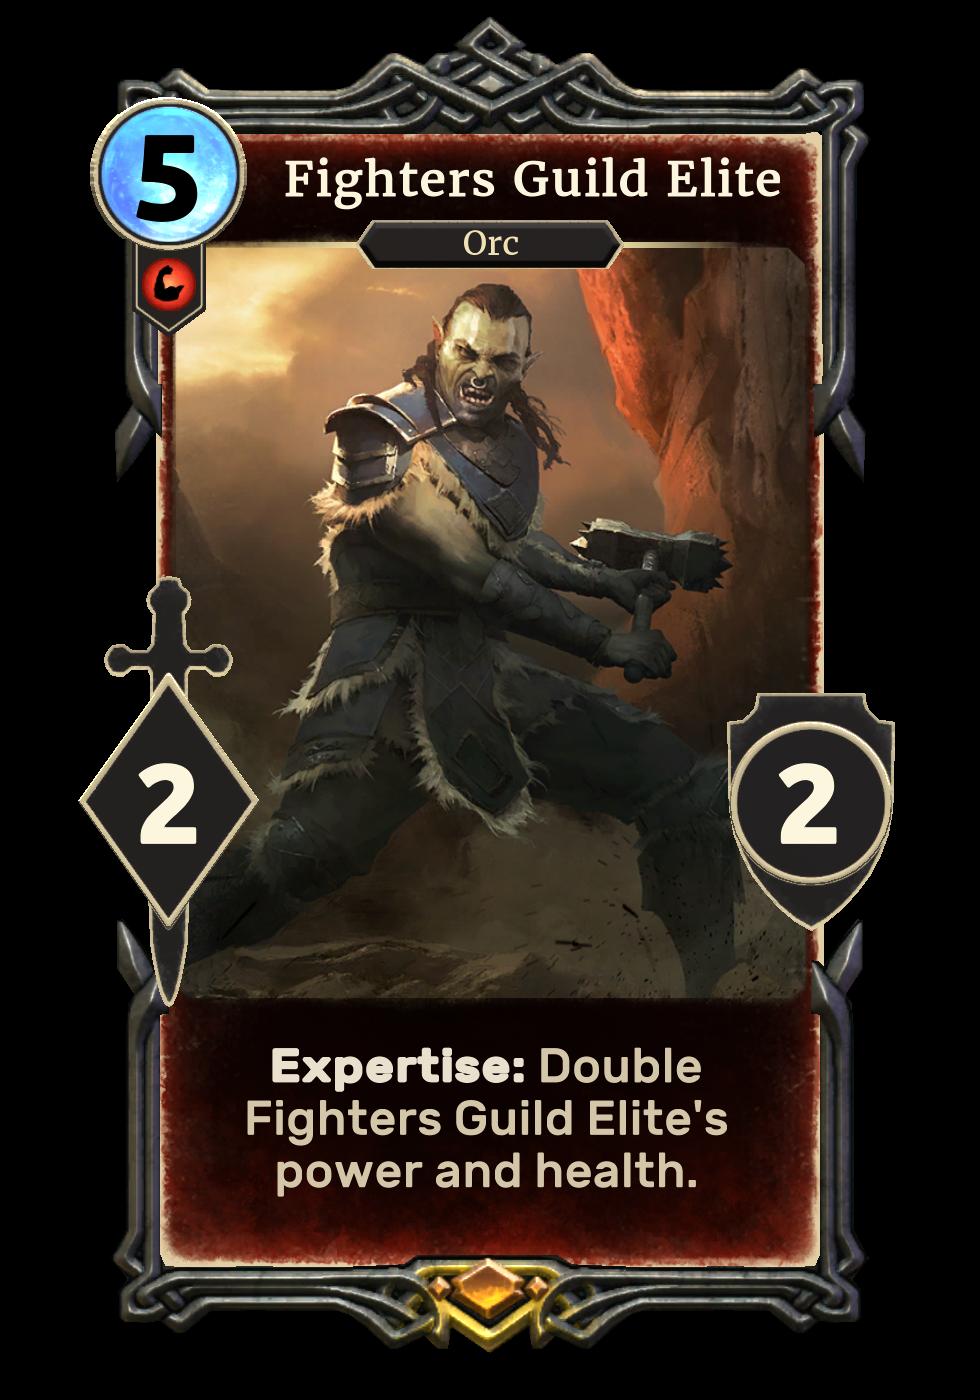 Fighters Guild Elite